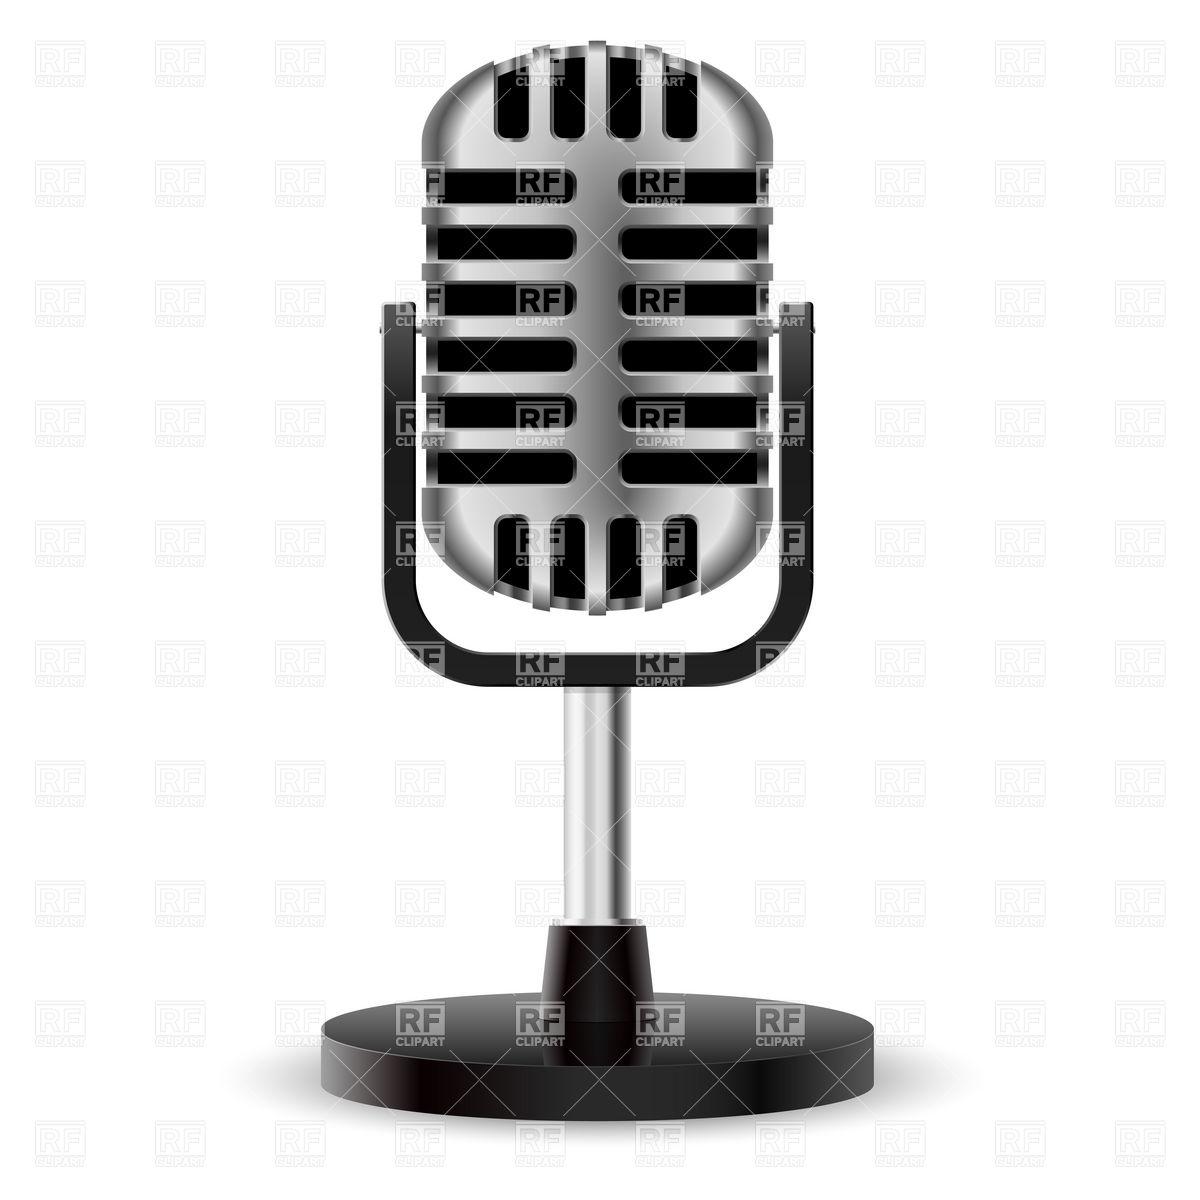 1200x1200 Chrome Retro Desktop Microphone Vector Image Vector Artwork Of